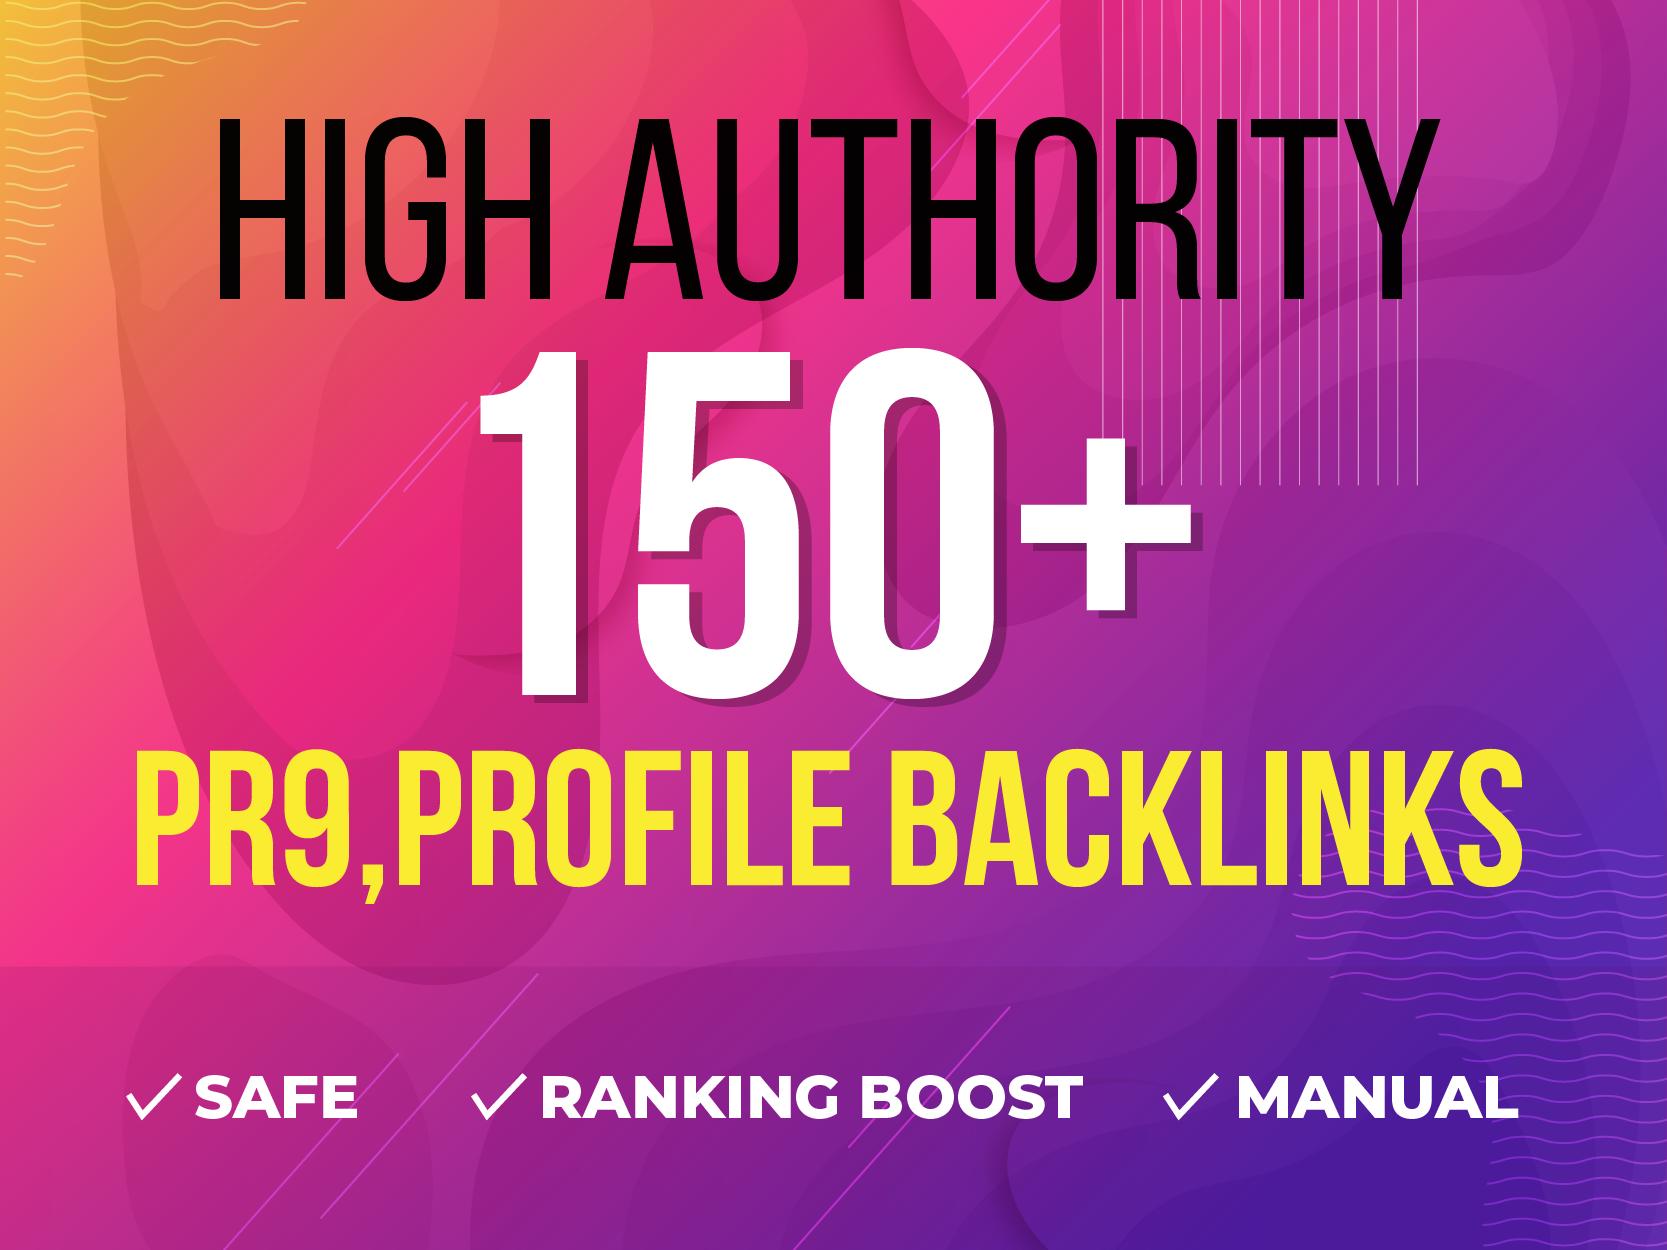 Manually 150+ High Authority PR9,  Profile and SEO Backlinks